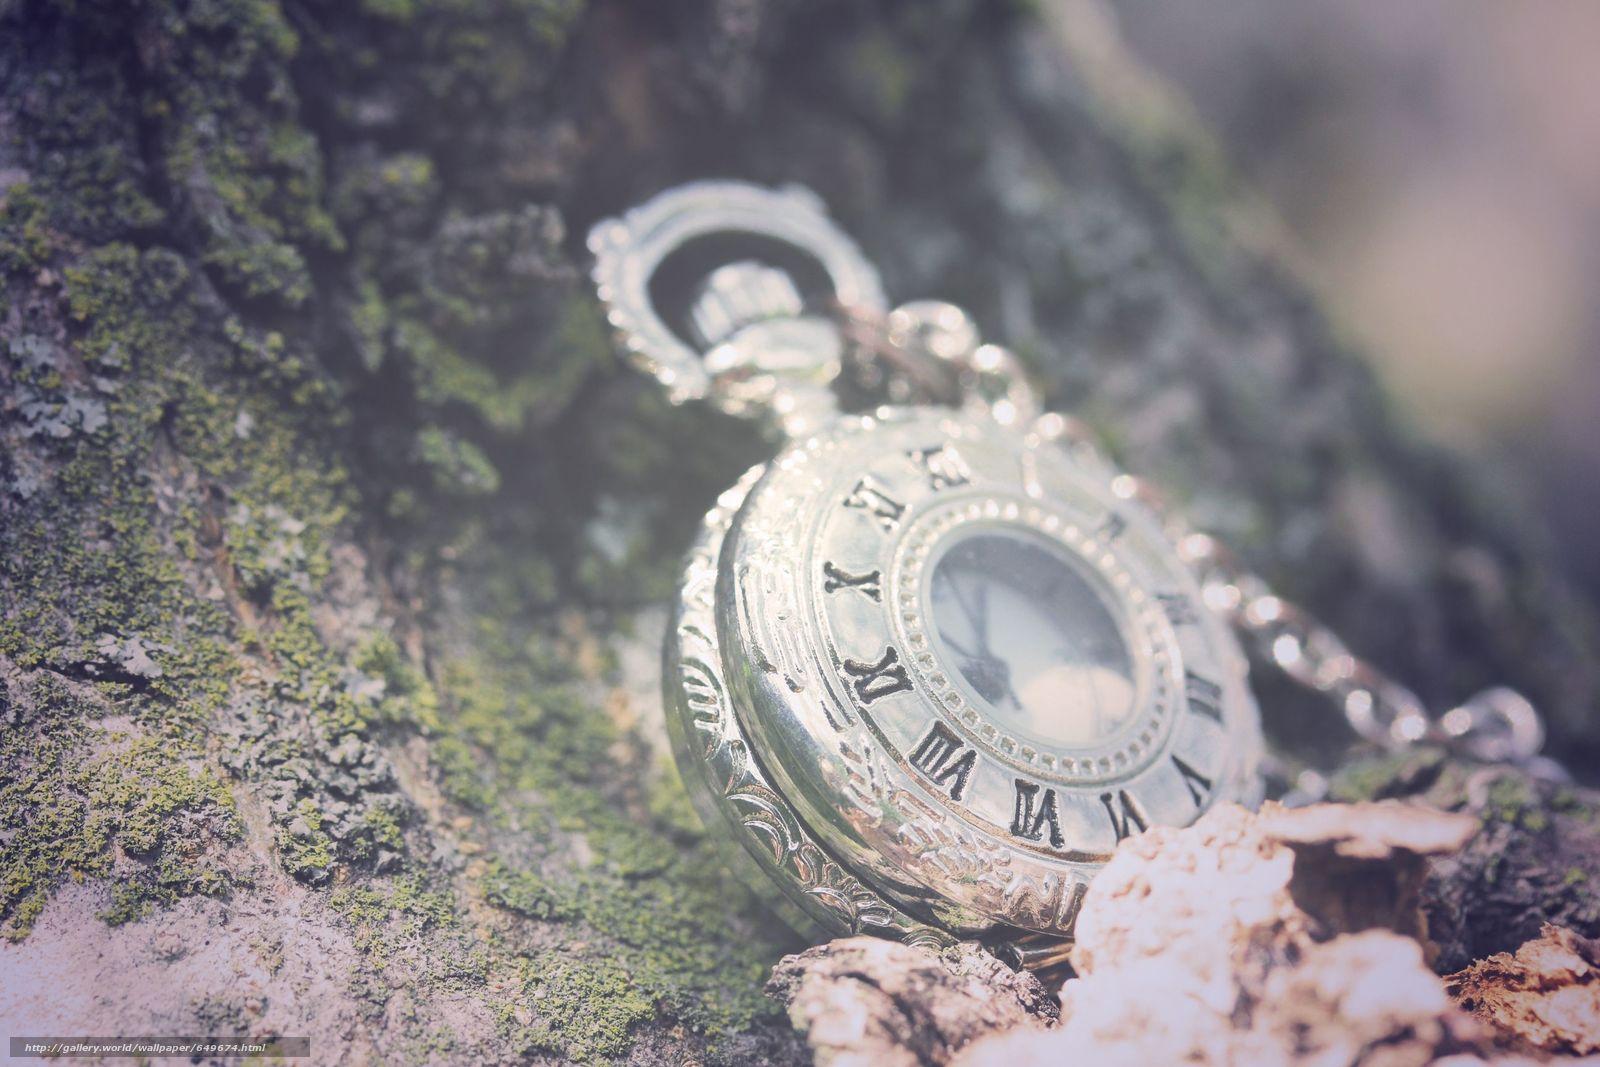 Download wallpaper watch,  watch,  nature,  KORA free desktop wallpaper in the resolution 2592x1728 — picture №649674